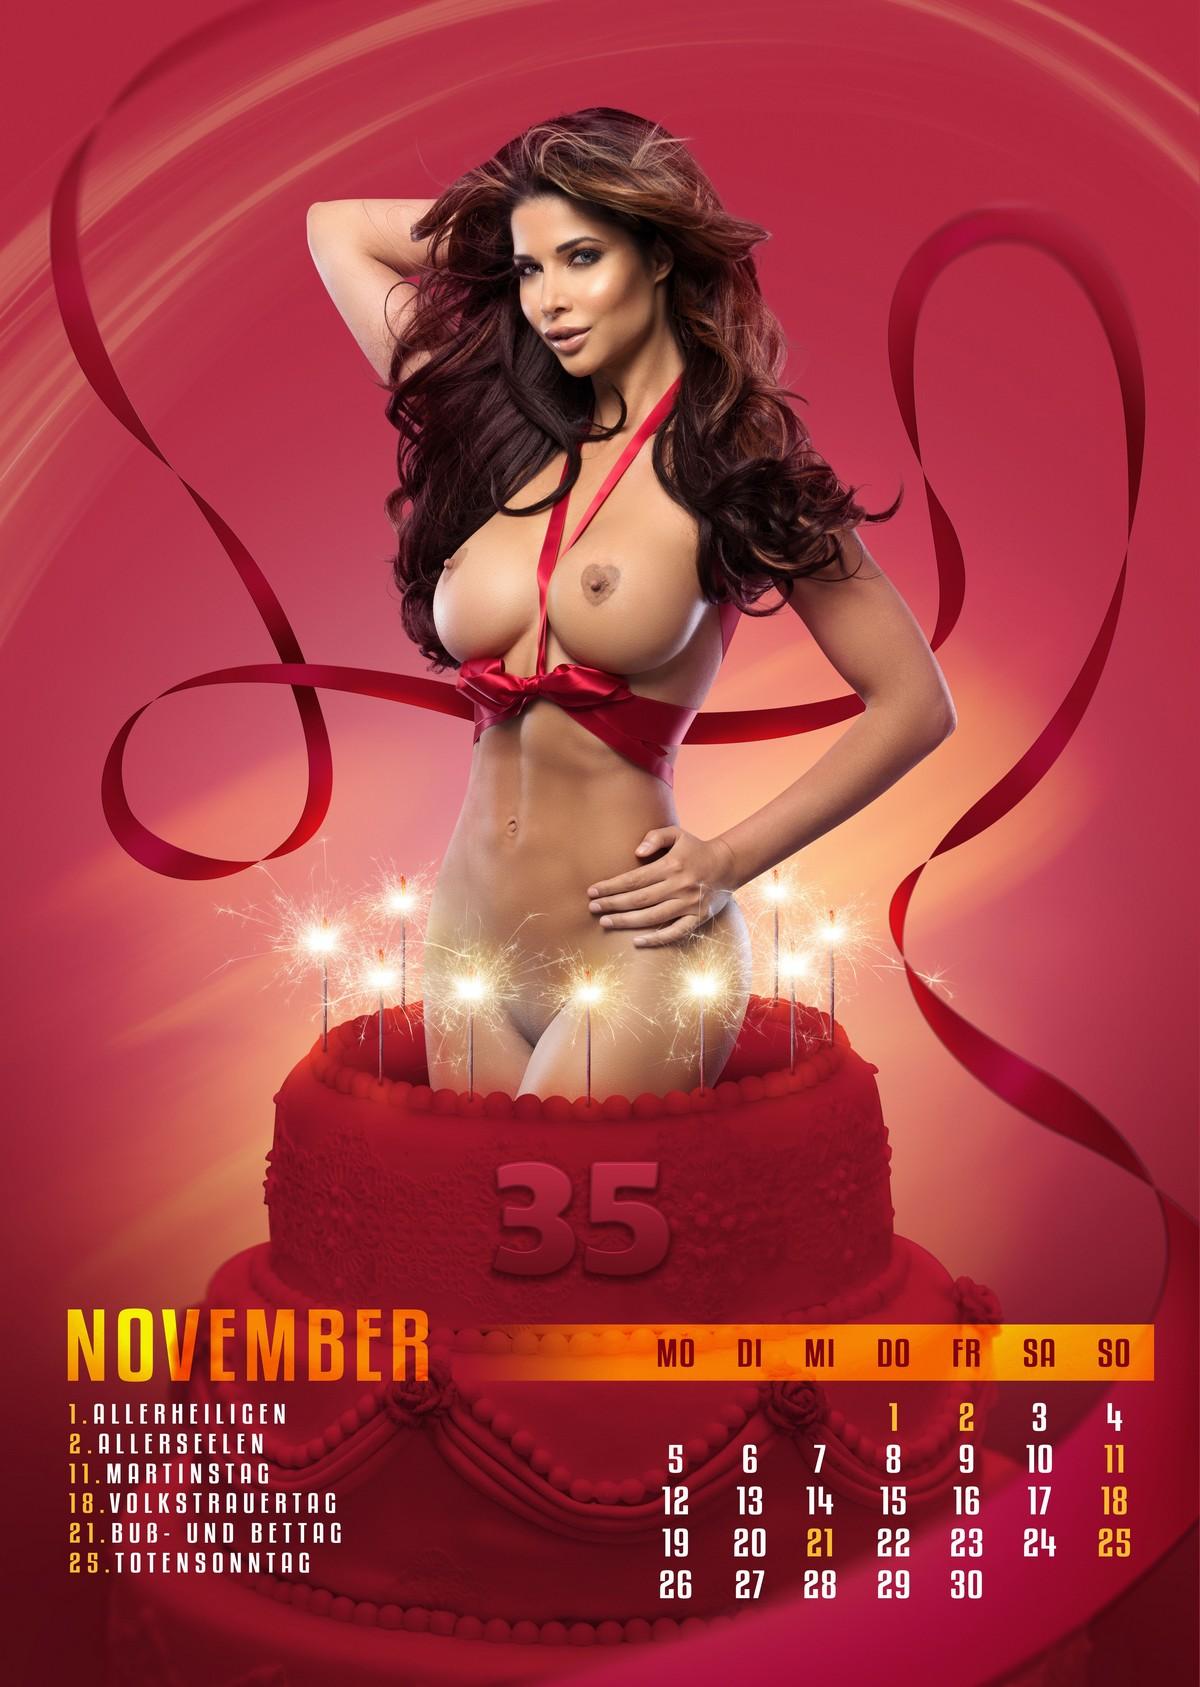 Микаэла Шефер разделась для календаря